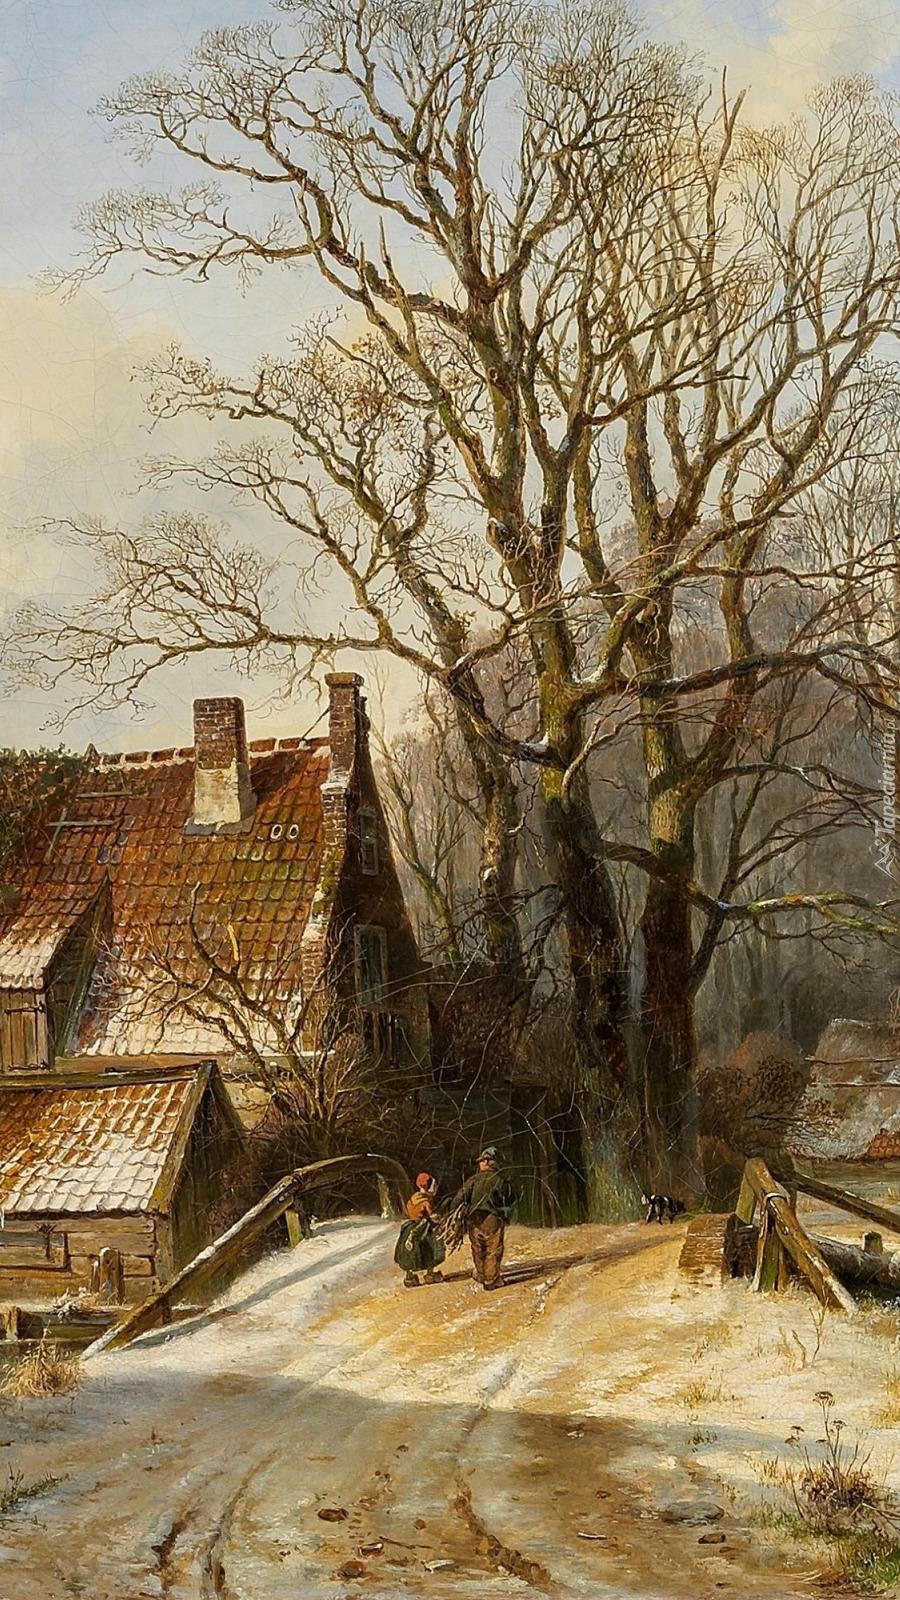 Malarstwo Fransa Arnolda Breuhaus de Groota